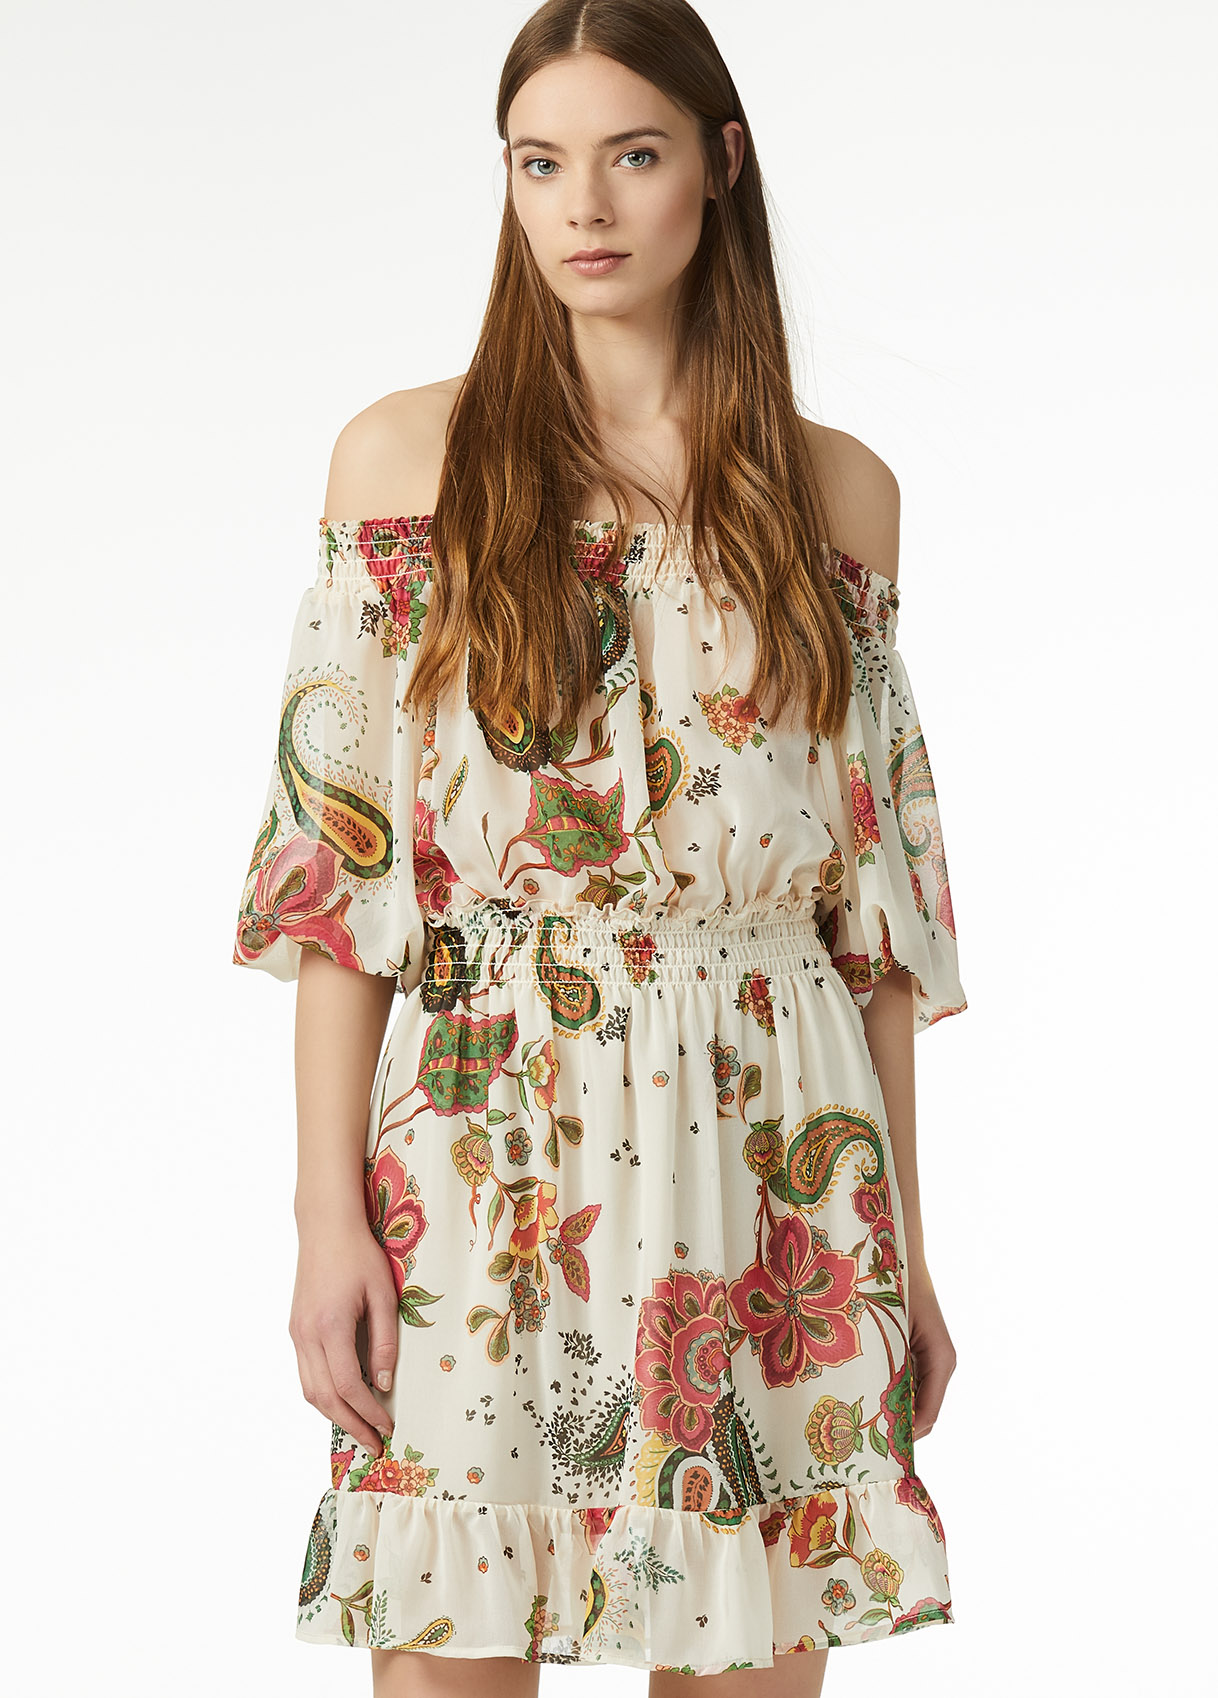 LiuJo-Dresses-Shortdresses-F19207T0110U9089-I-AF-N-N-01-N